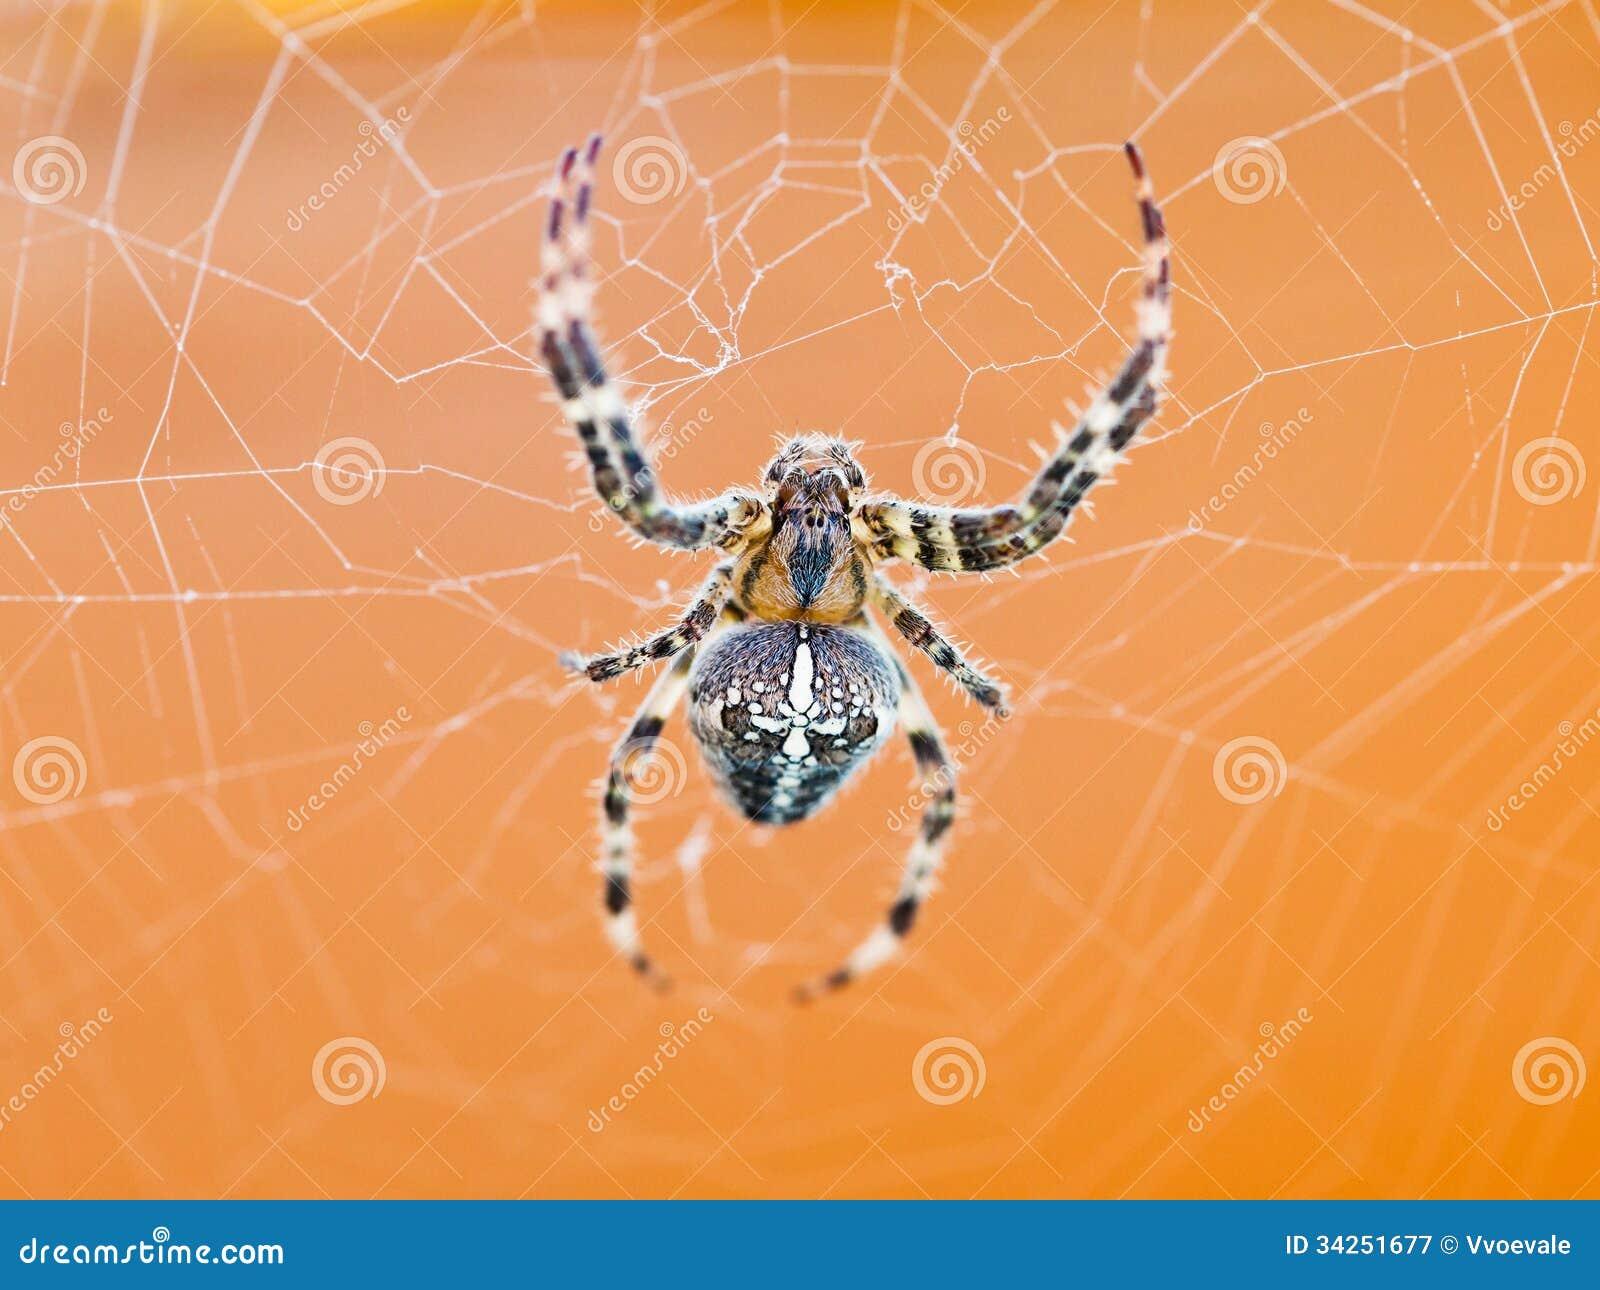 Взгляд сверху паука на паутине